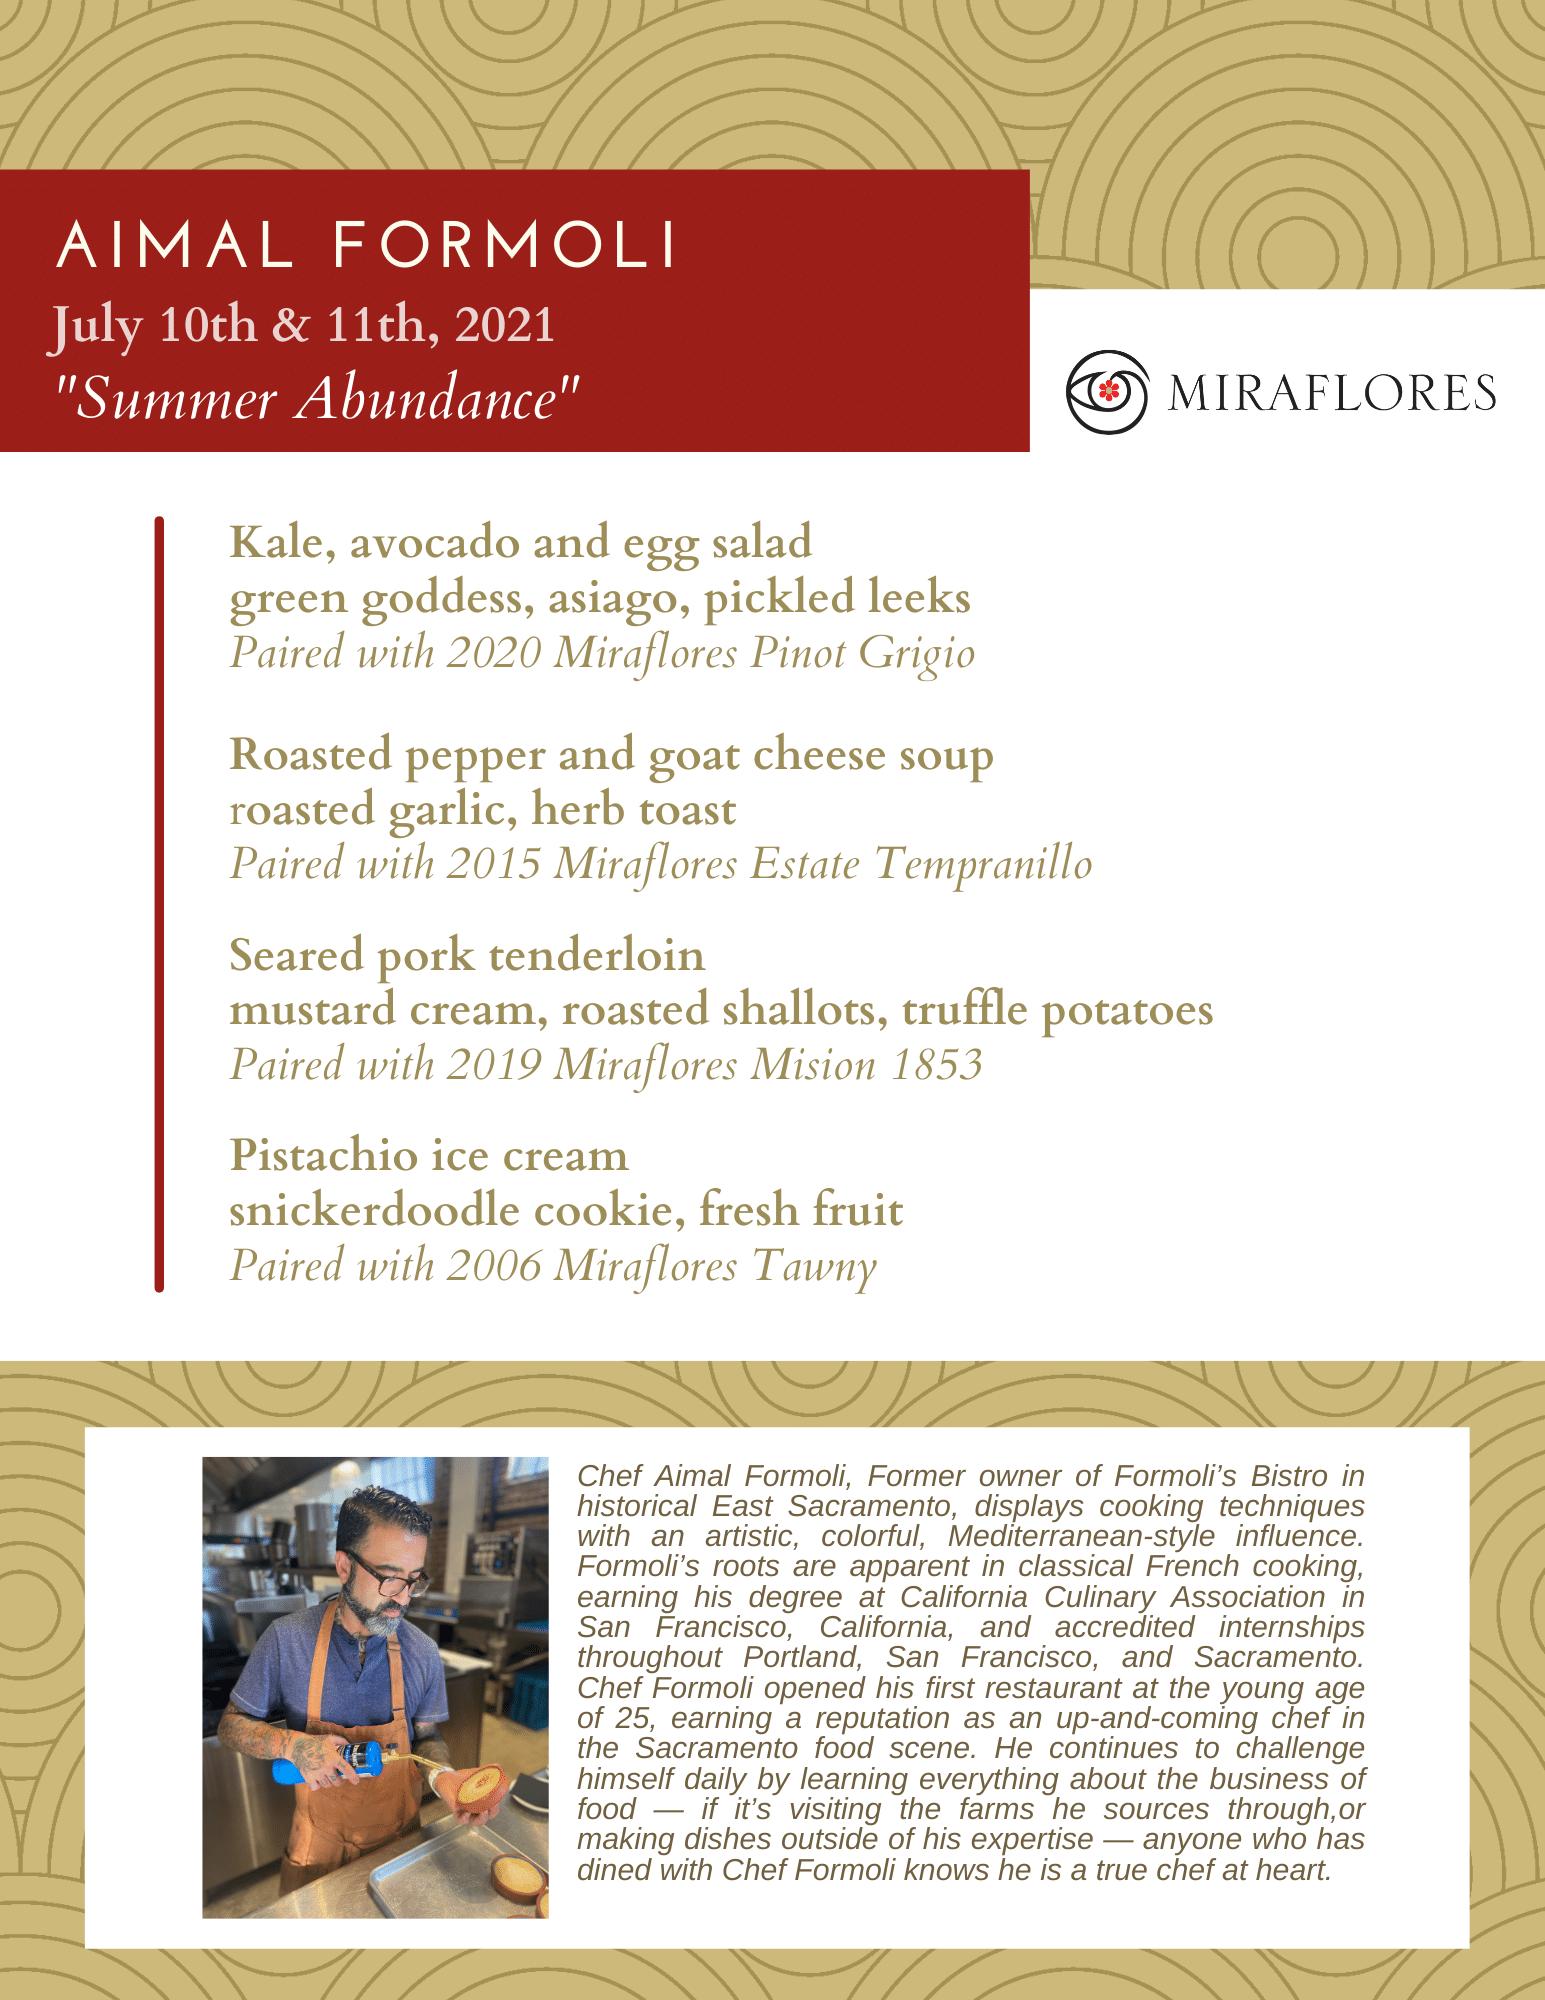 Chef pairing Aimal Formoli